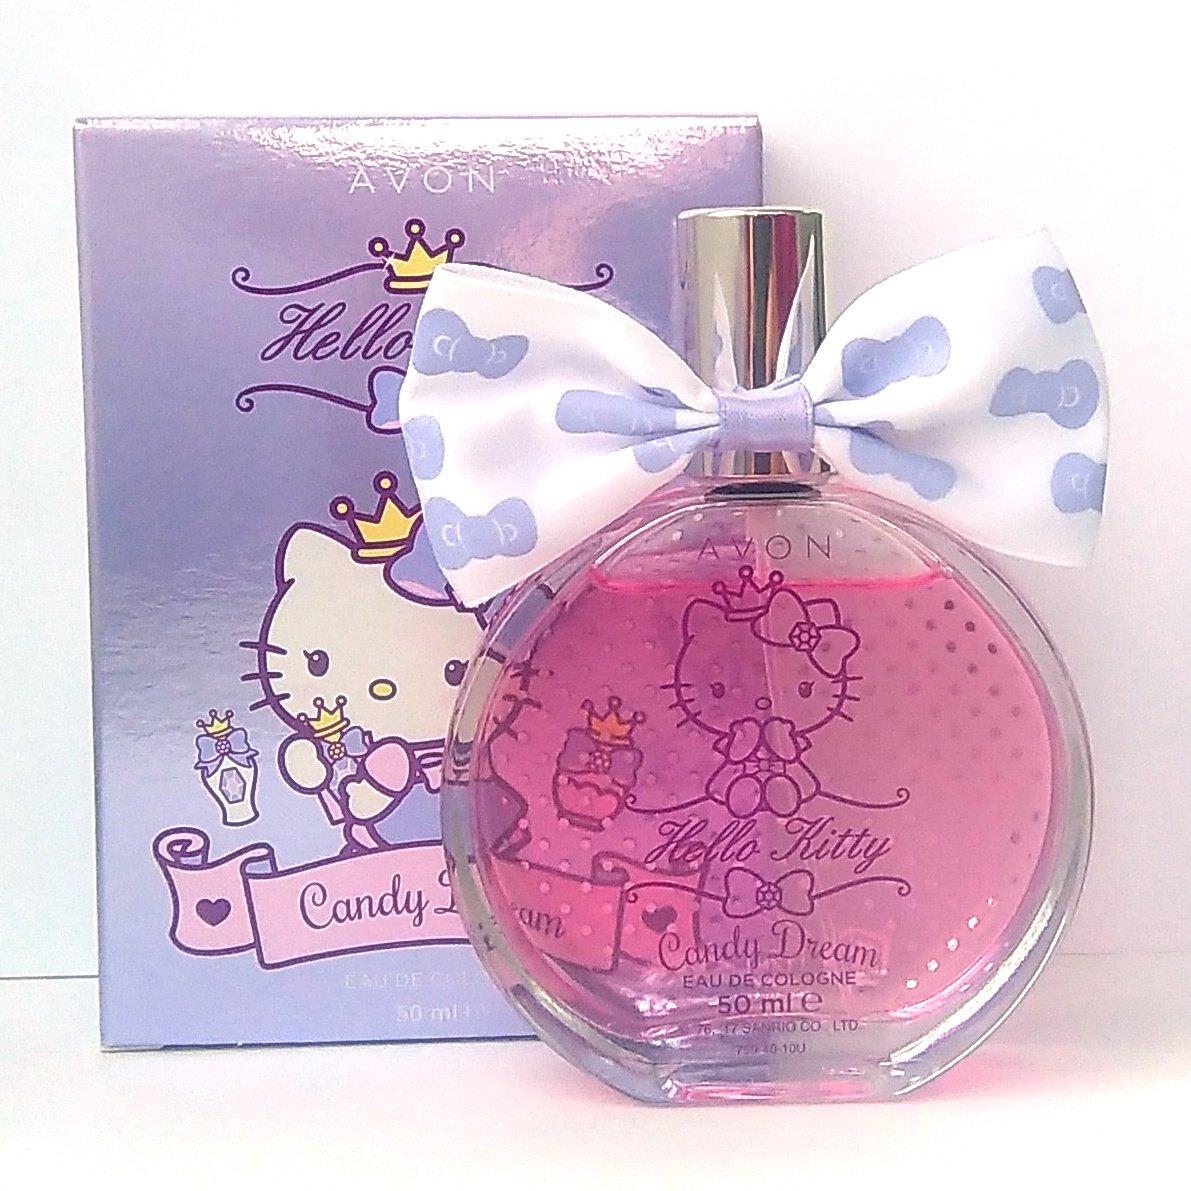 AVON Hello Kitty Candy Dream Eau de Cologne 50ml - 1.7oz by Avon (Image #1)